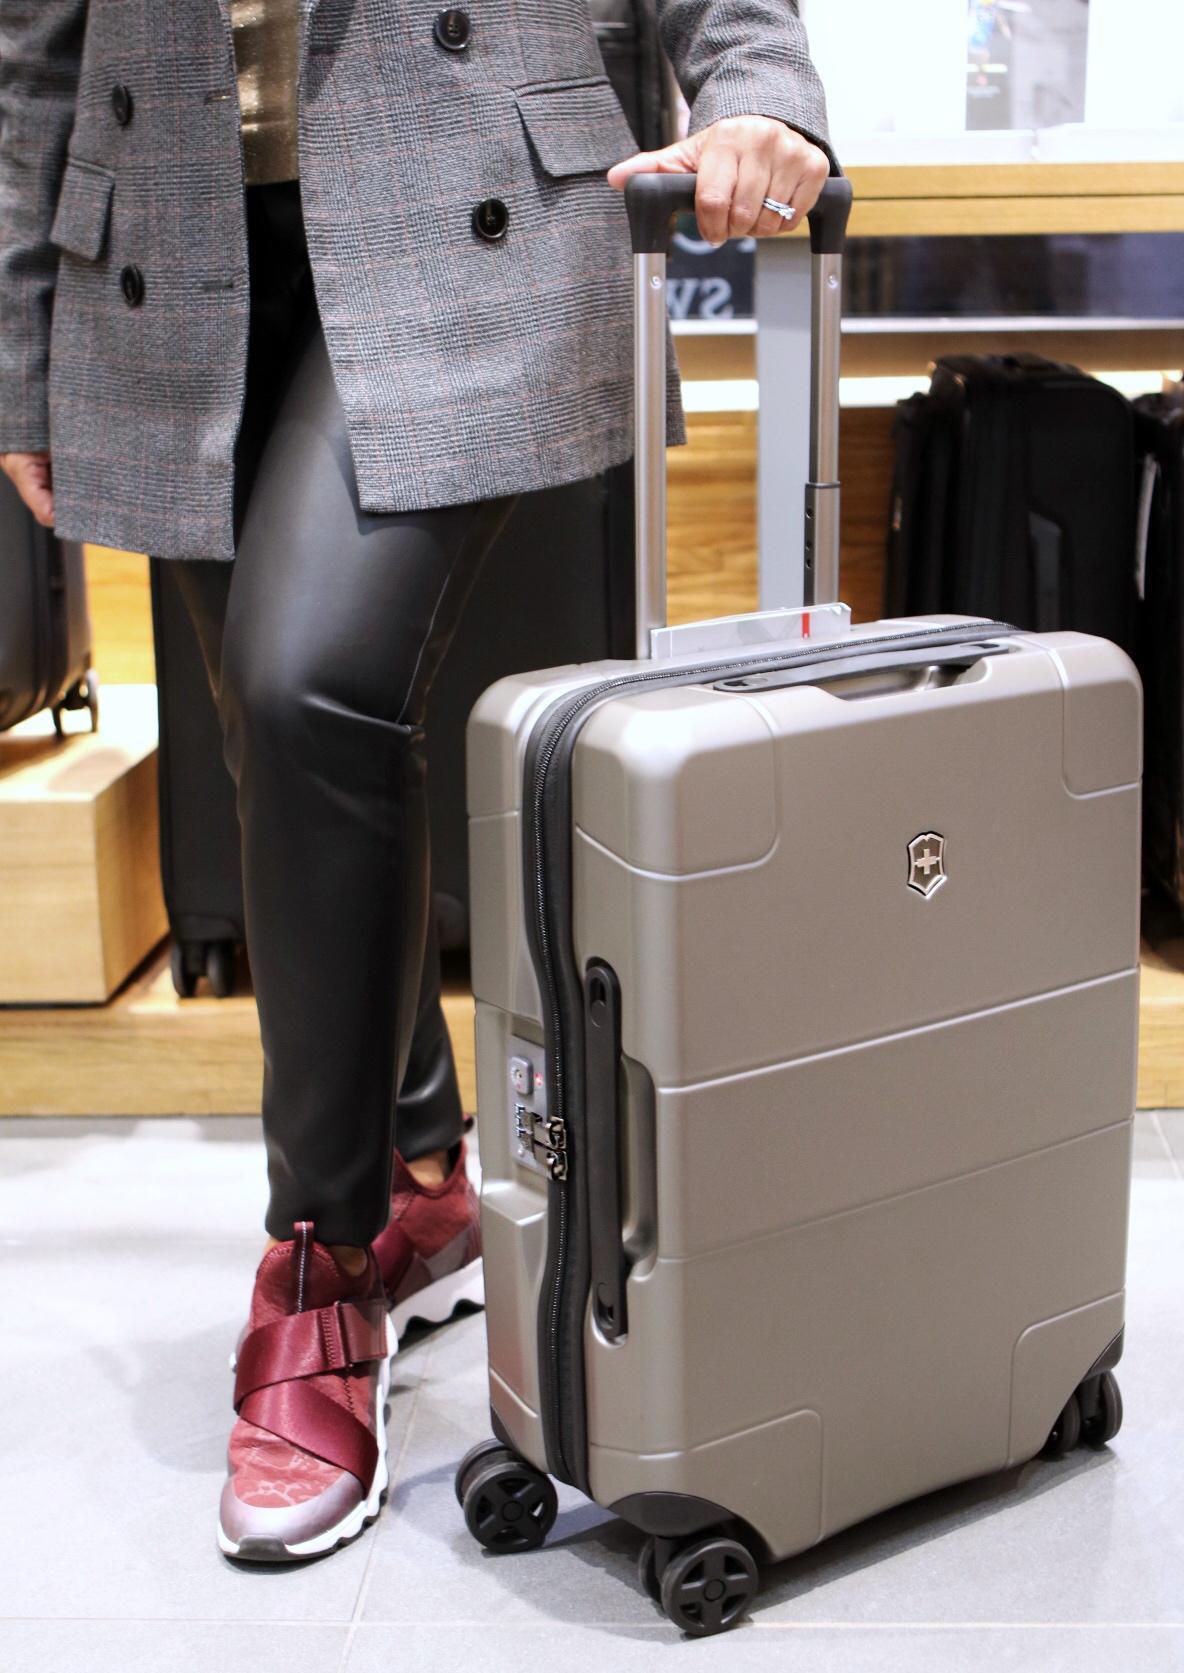 Victorinox - luggage at Rockefeller Center